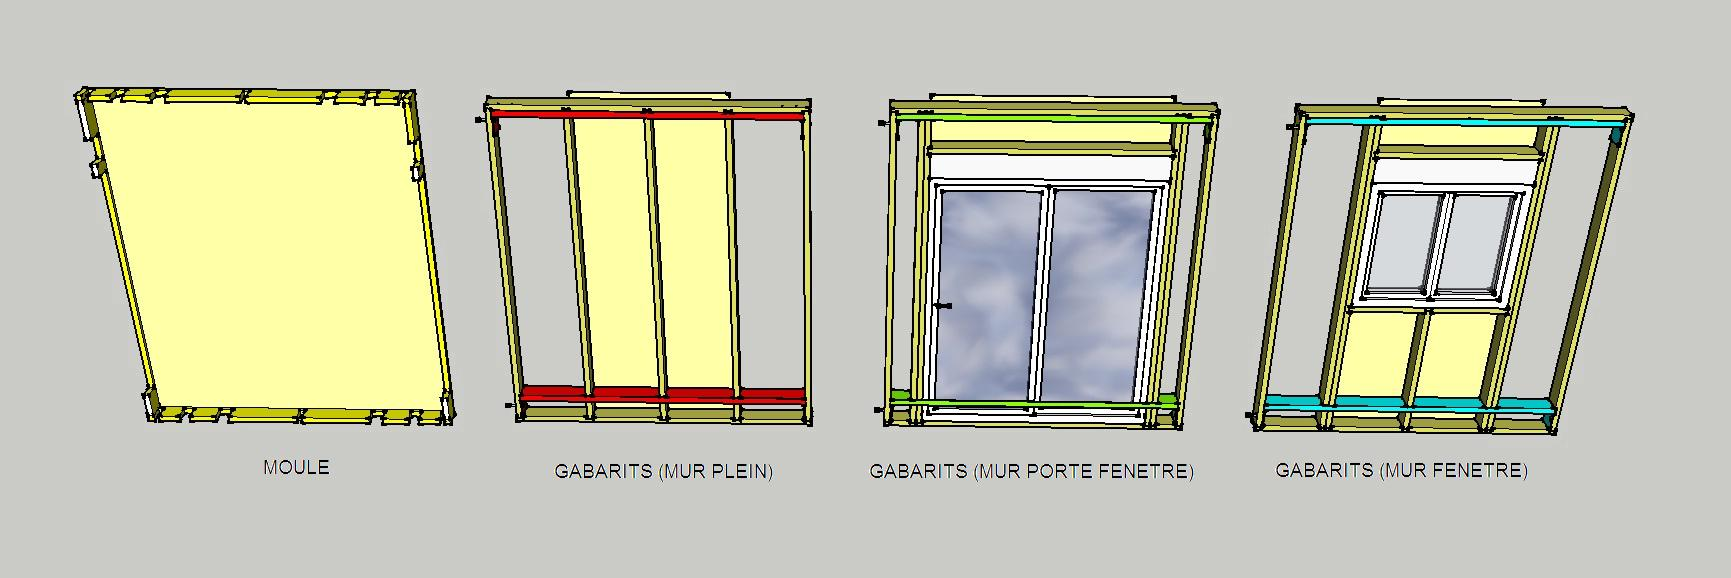 maison ossature bois modulable. Black Bedroom Furniture Sets. Home Design Ideas